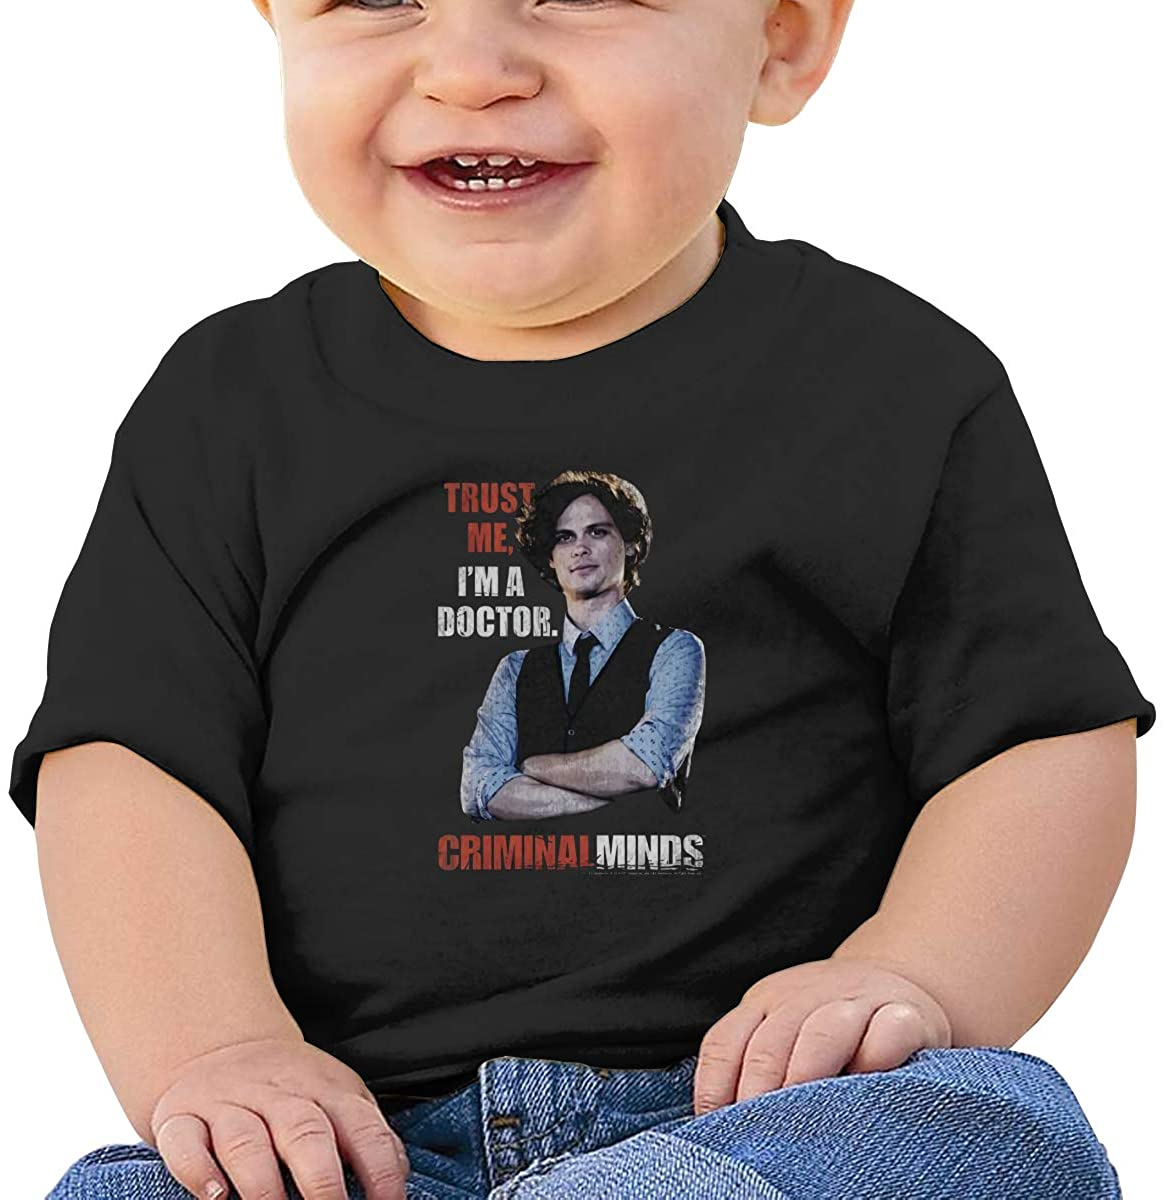 Korlav Boy's T-Shirt,Criminal Minds Short Sleeve Round Neck T-Shirt, 100% Organic Cotton.